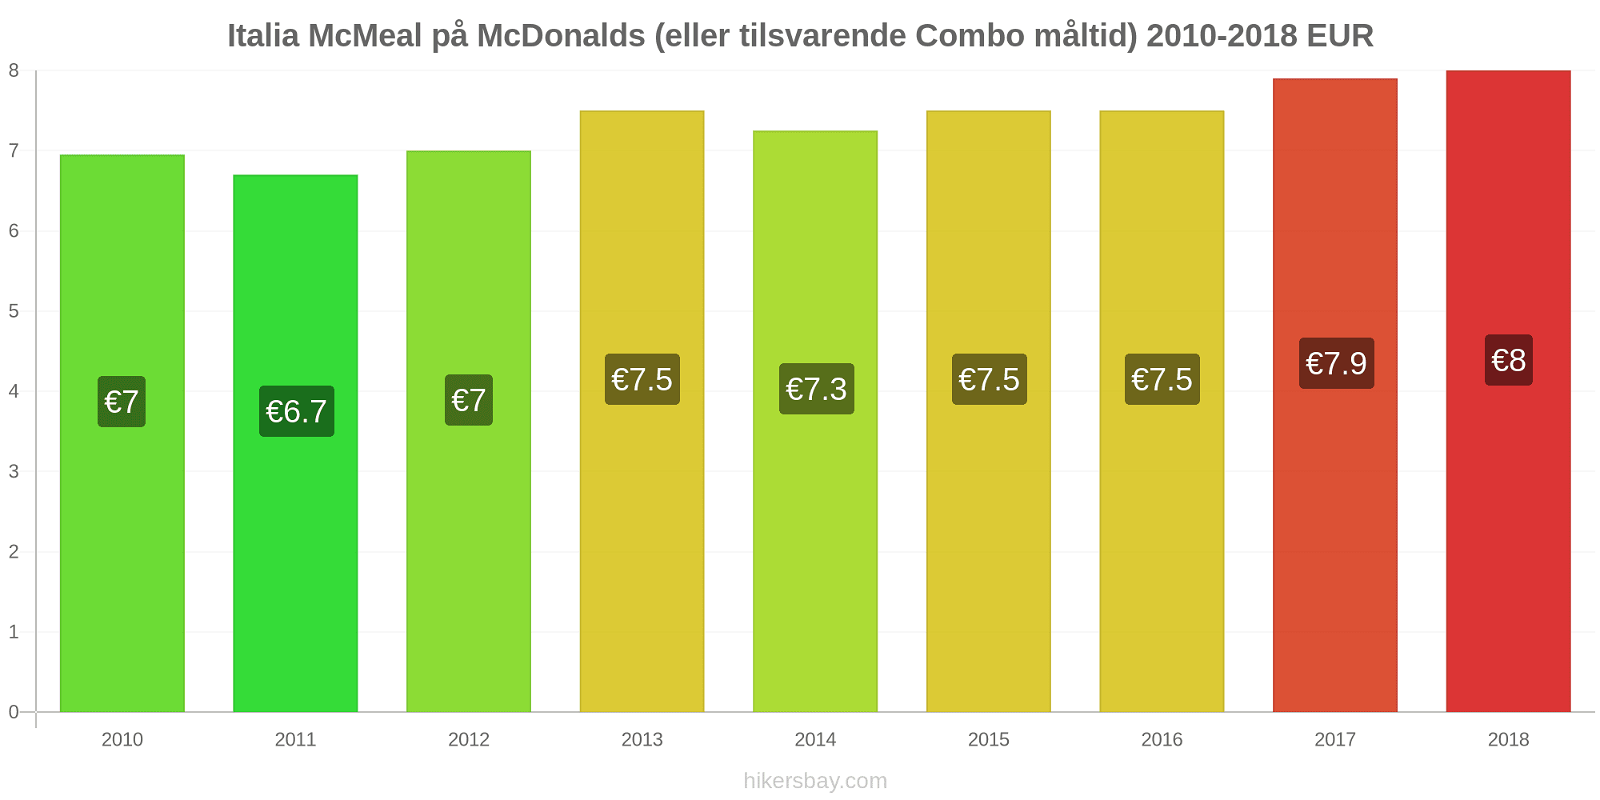 Italia prisendringer McMeal på McDonalds (eller tilsvarende Combo måltid) hikersbay.com